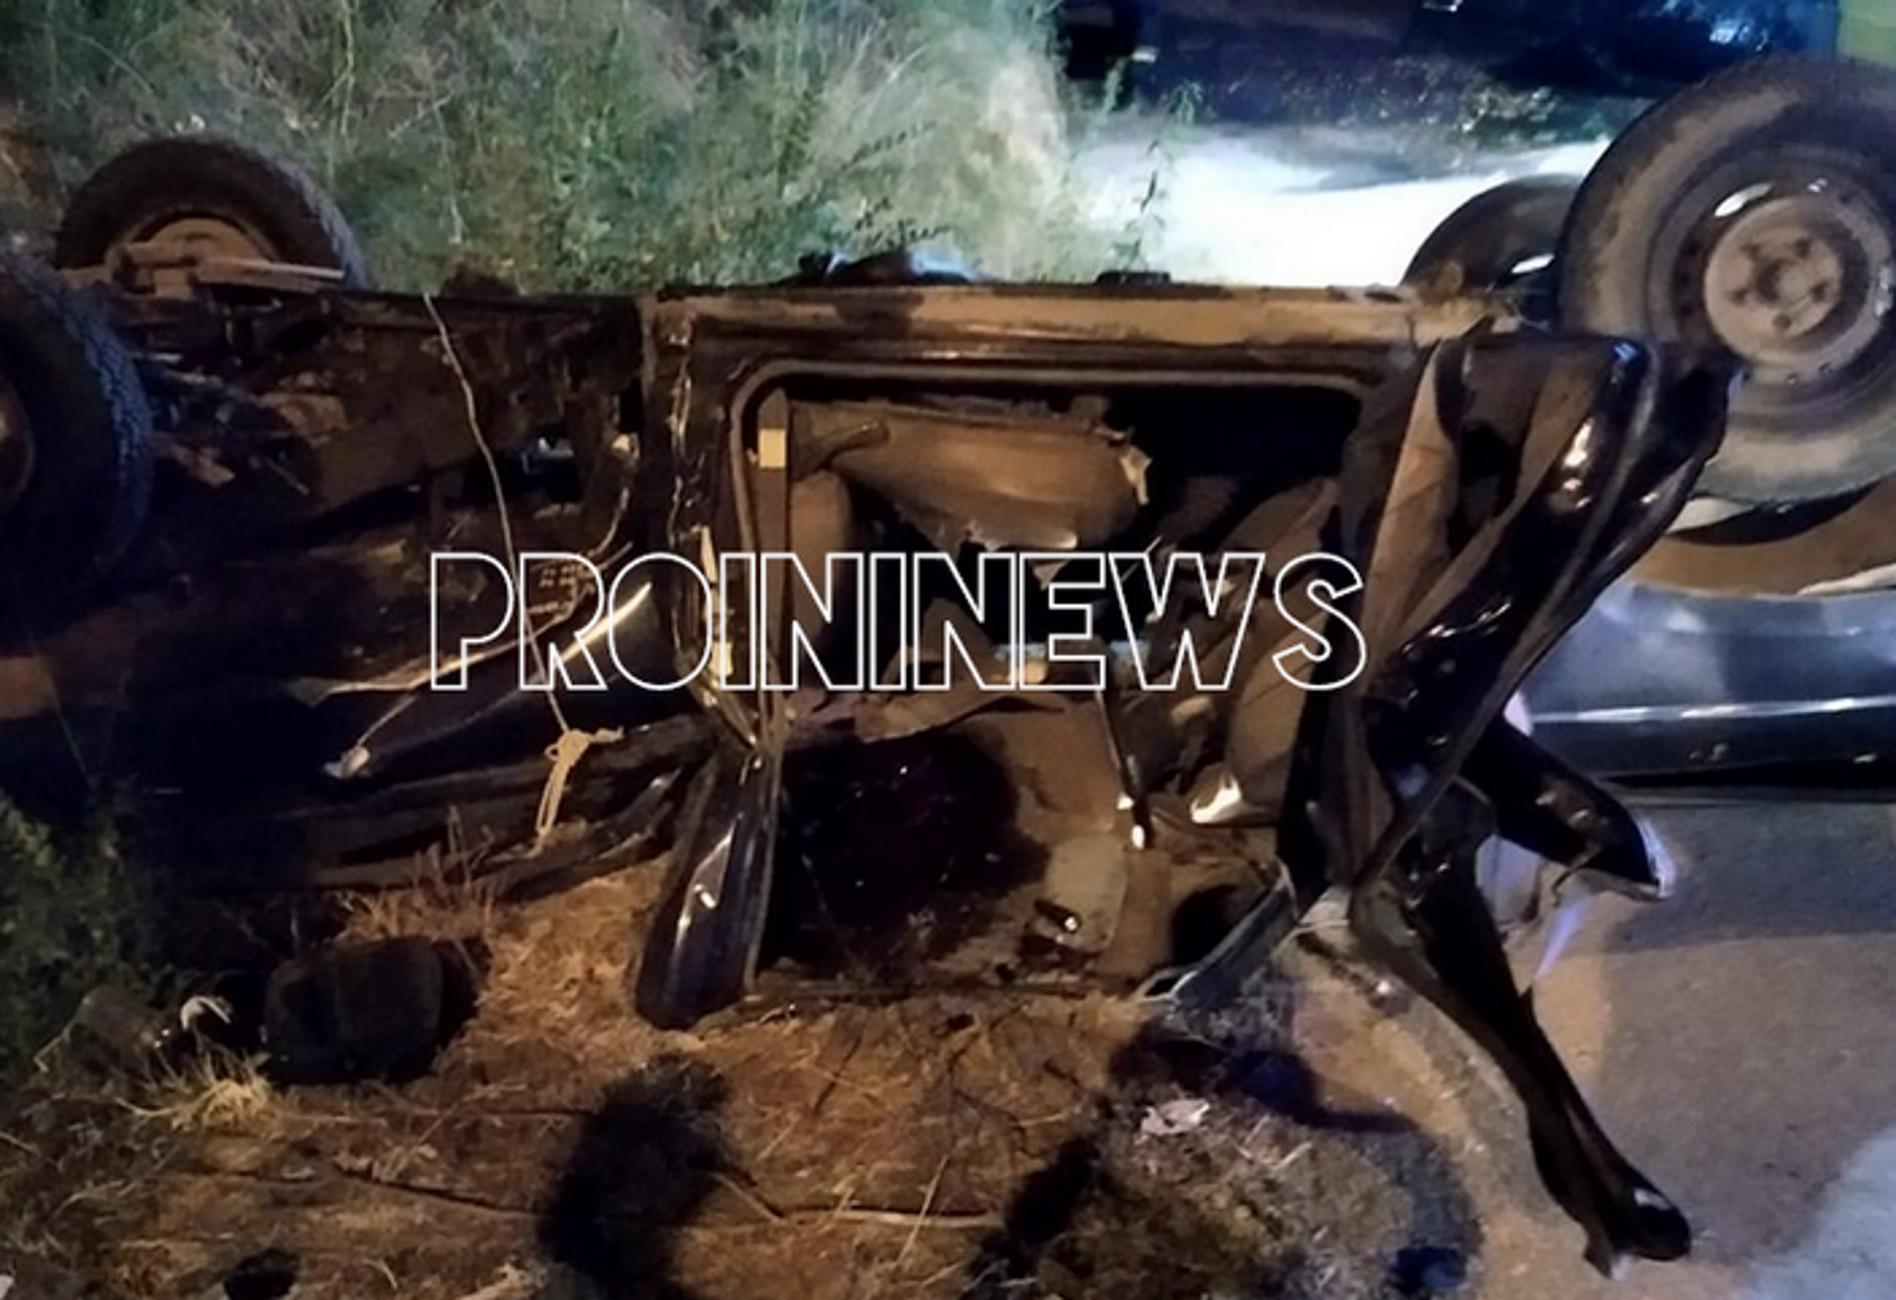 Tροχαίο στην Καβάλα με πτώση δύο αυτοκινήτων από γέφυρα